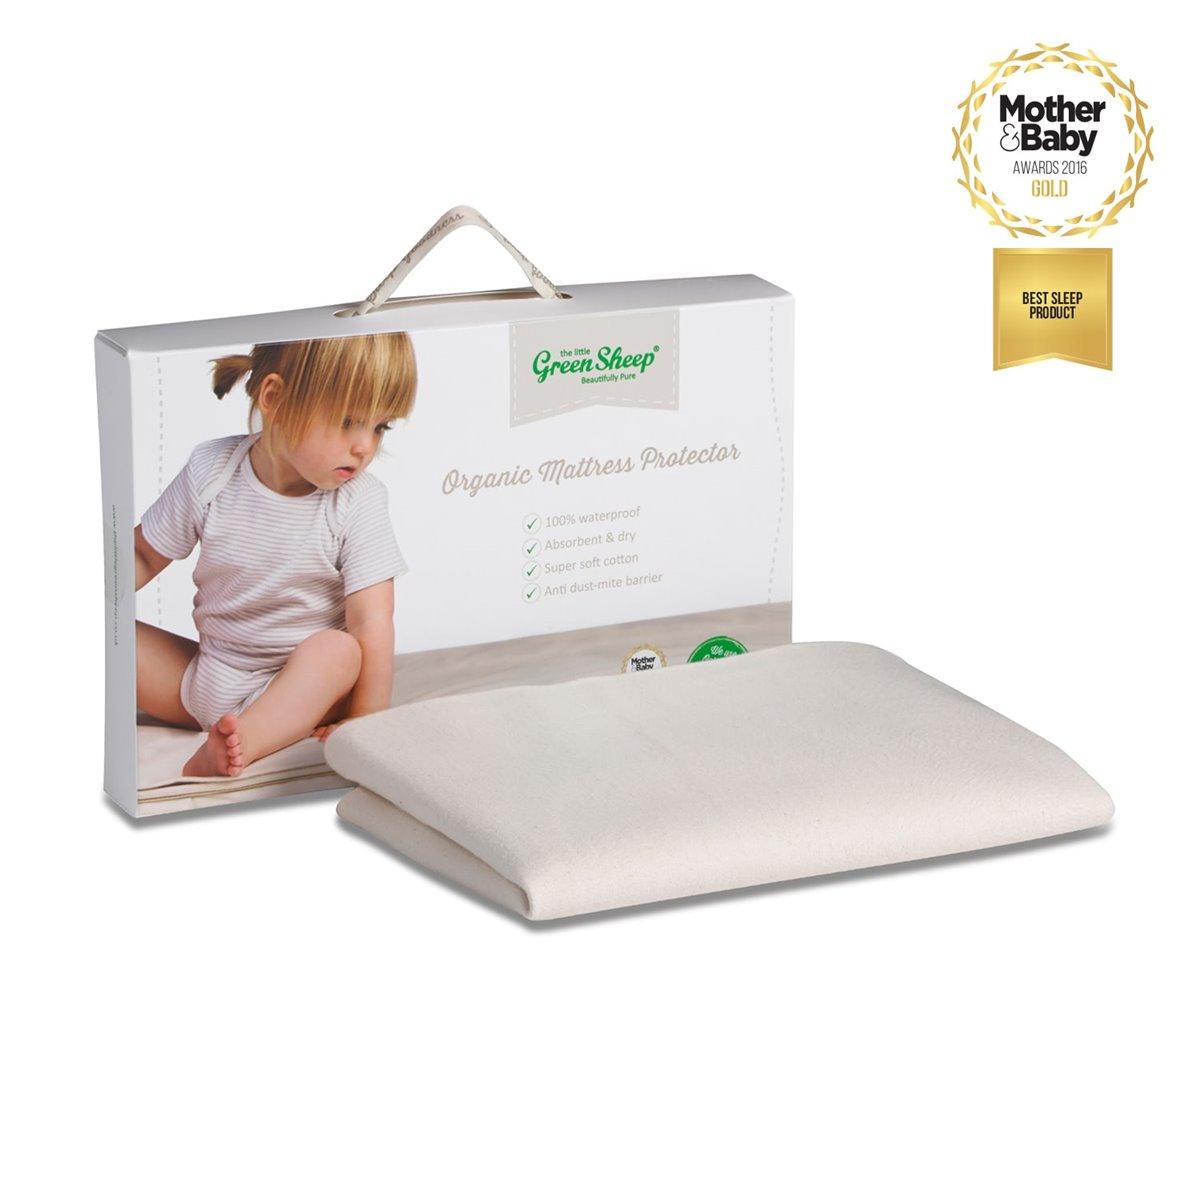 Waterproof Crib Mattress Protector 38x39cm The Little Green Sheep